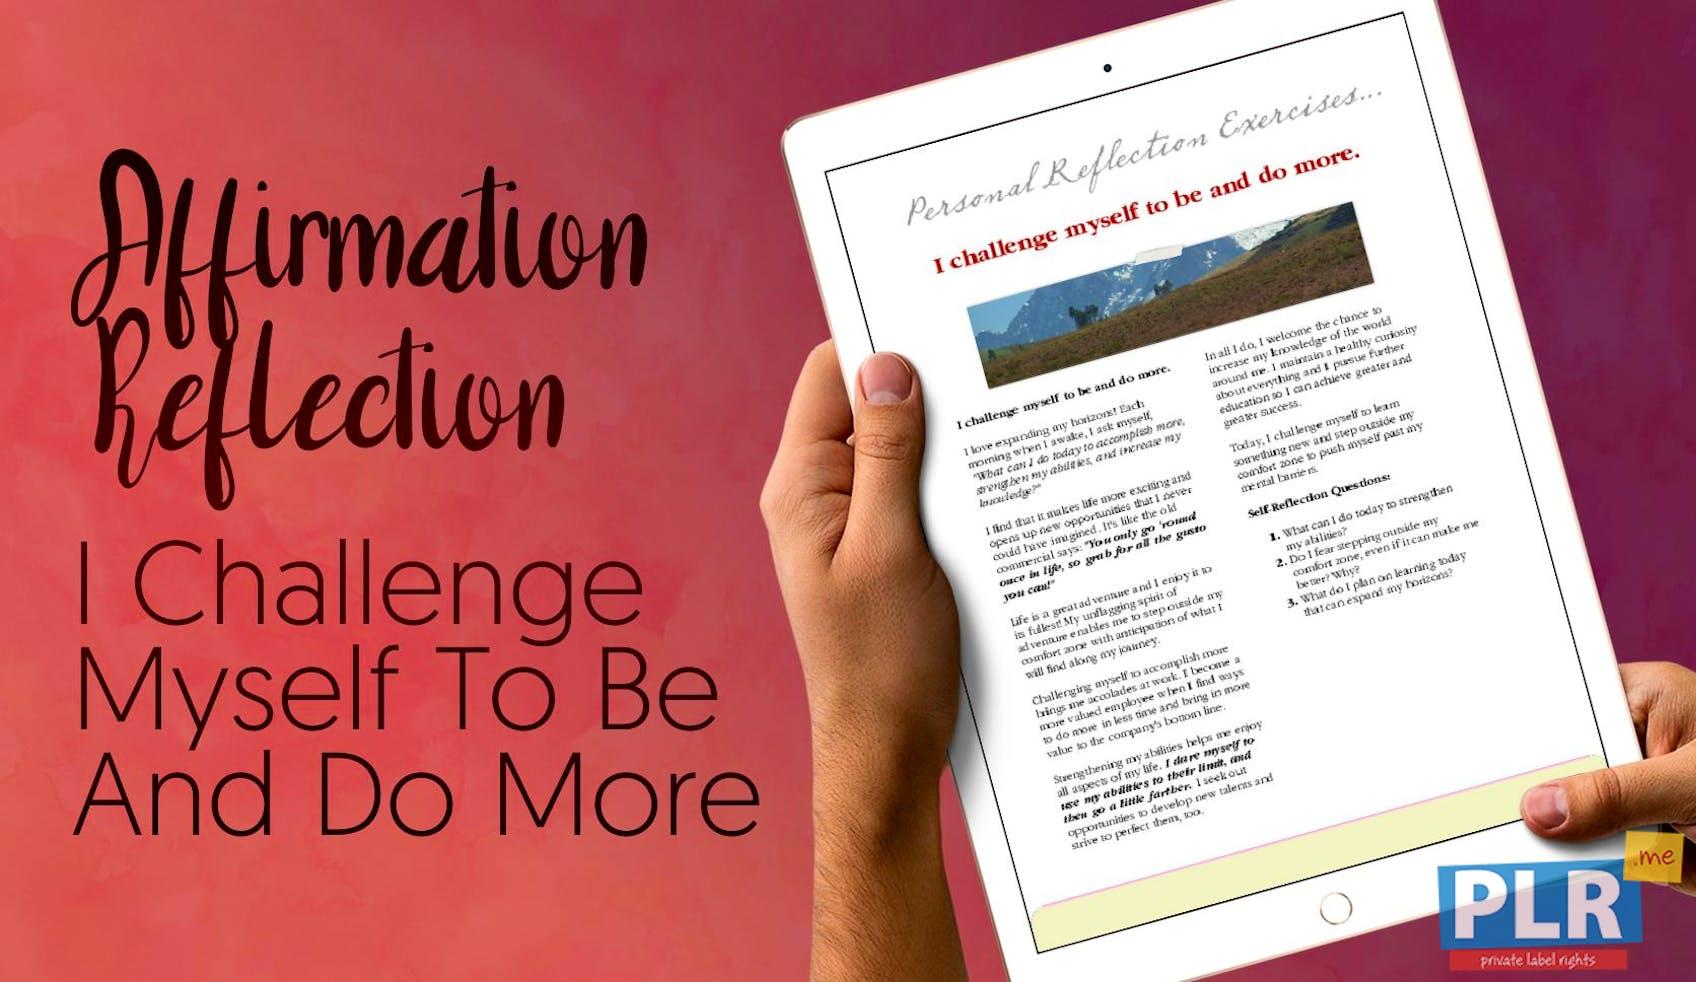 I Challenge Myself To Be And Do More